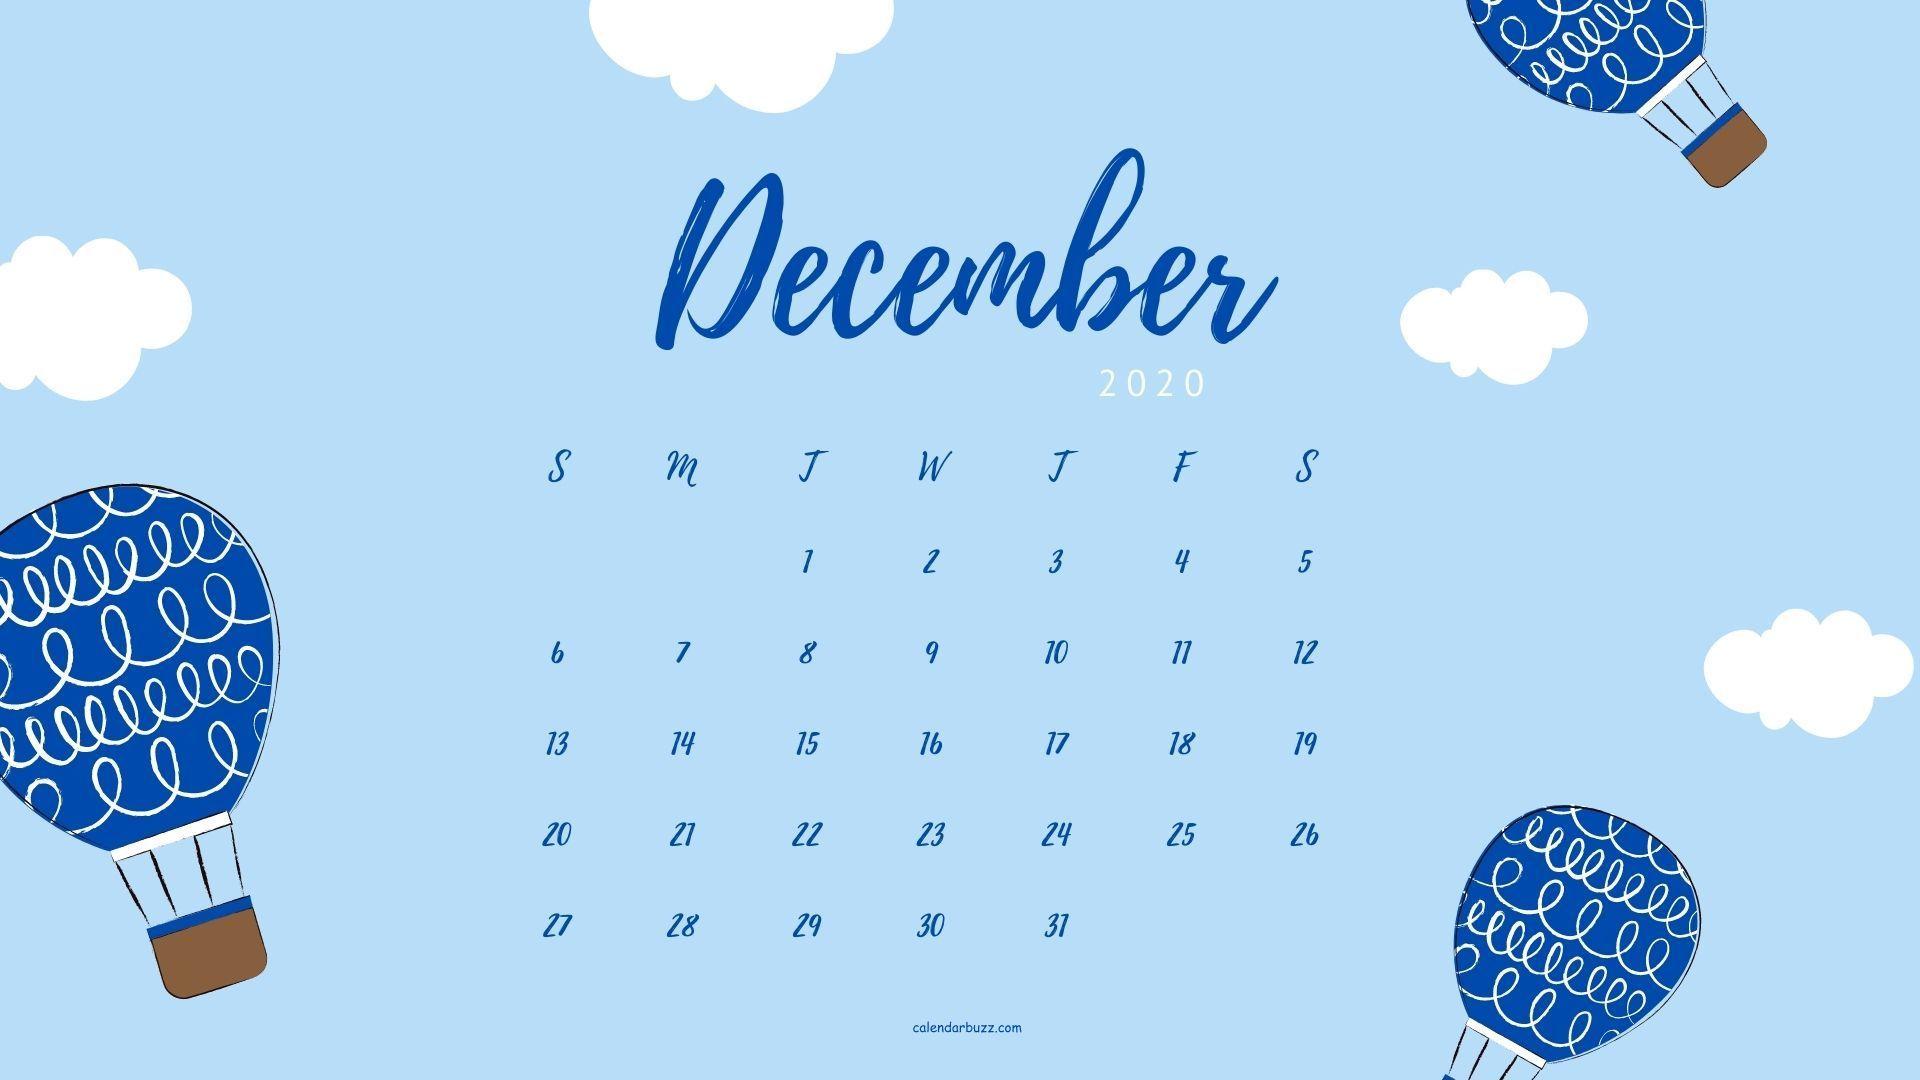 December 2020 Desktop Calendar Wallpaper in Landscape Mode in 2020 1920x1080